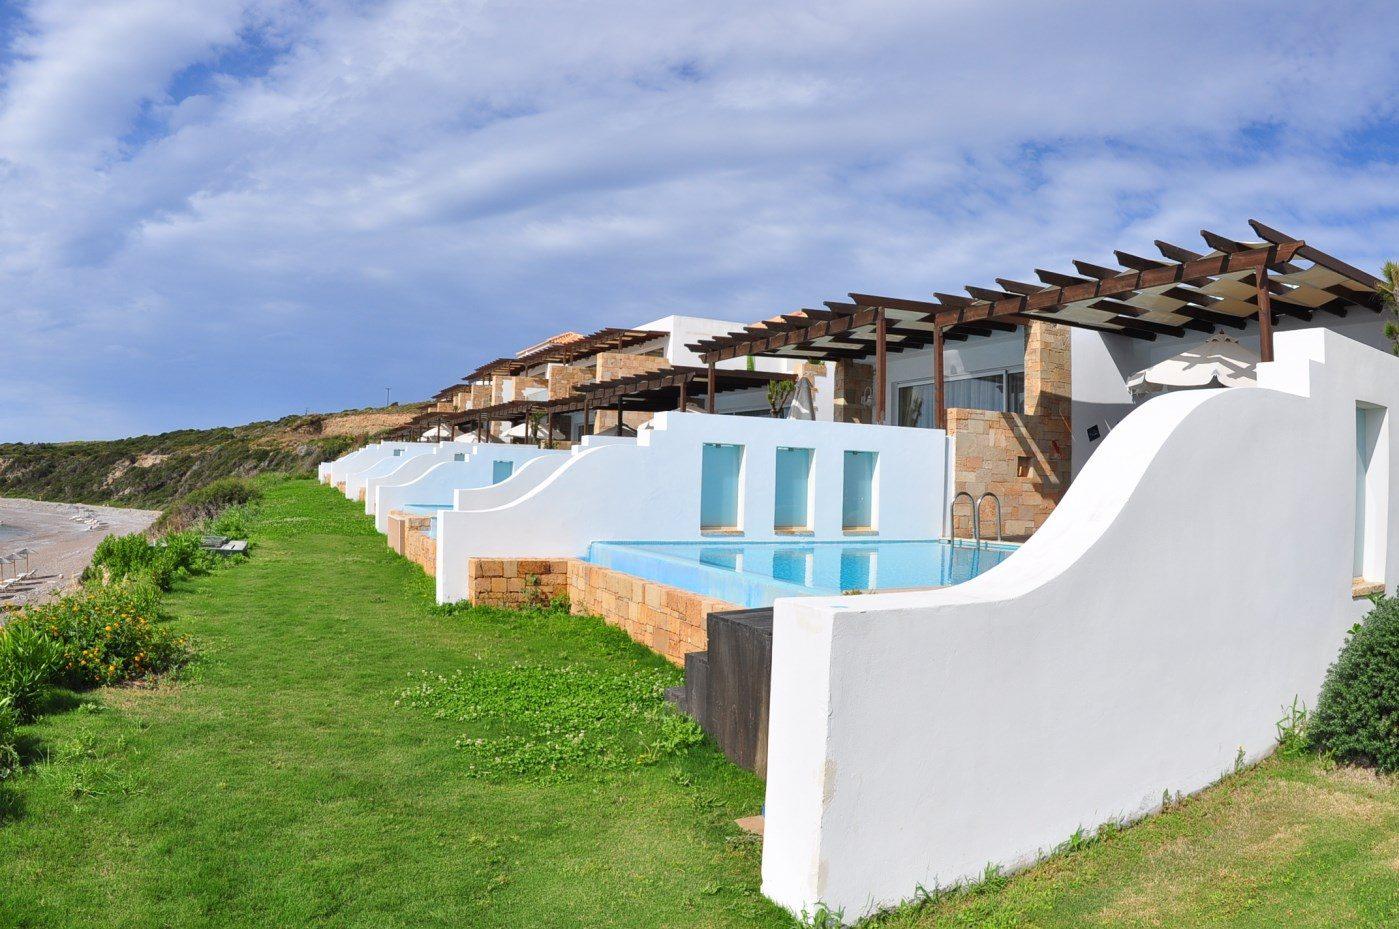 территория отеля Atrium Prestige Thalasso Spa Resort & Villas